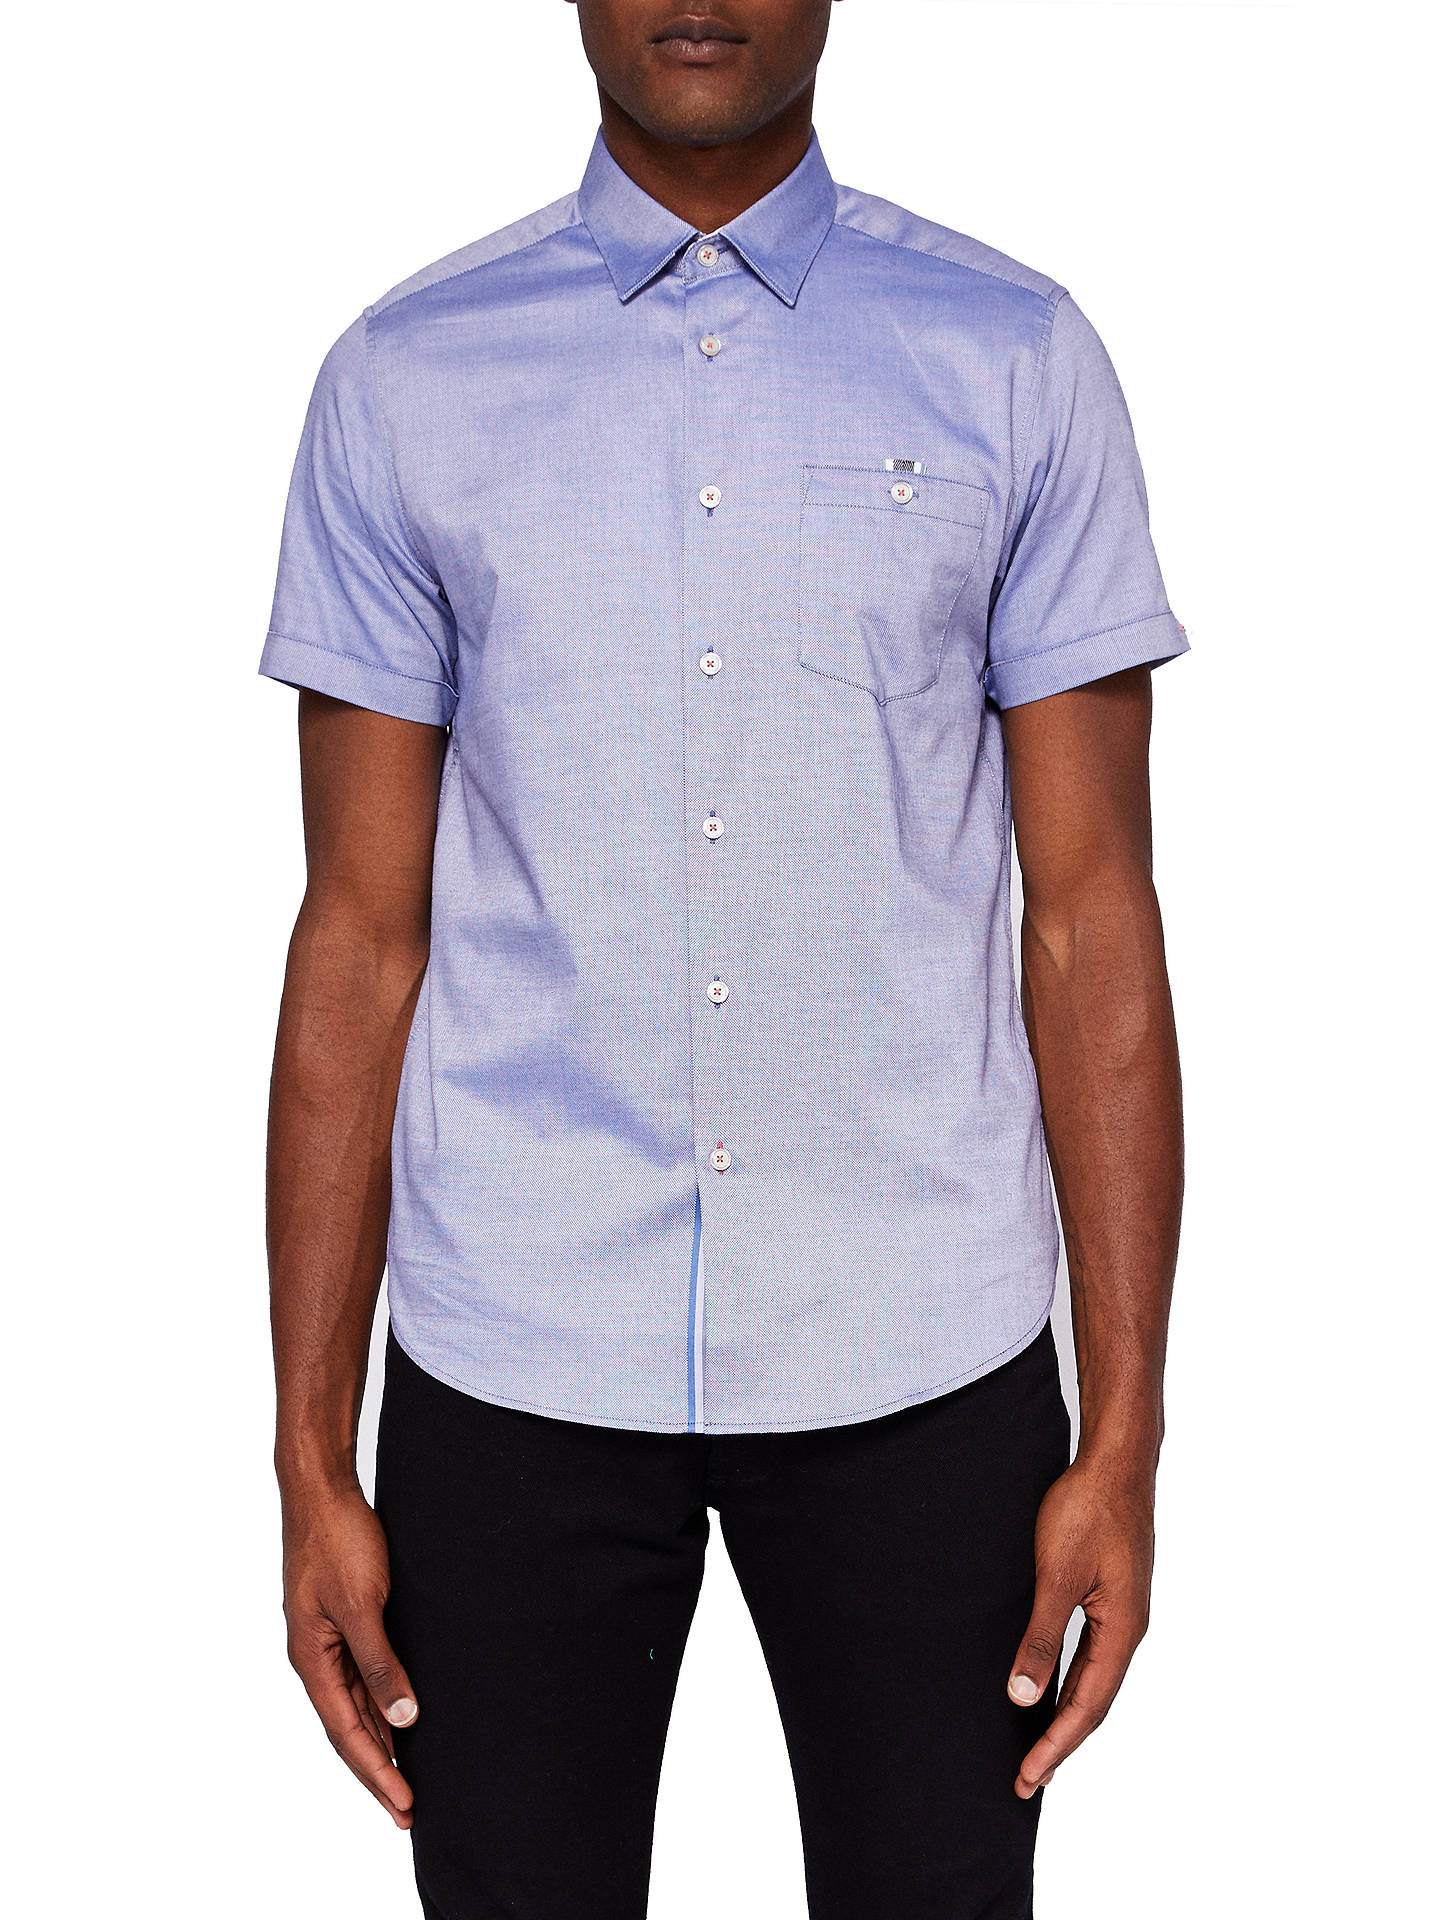 356dd3acccc9cf Ted Baker Wallo Short Sleeve Pocket Shirt at John Lewis   Partners